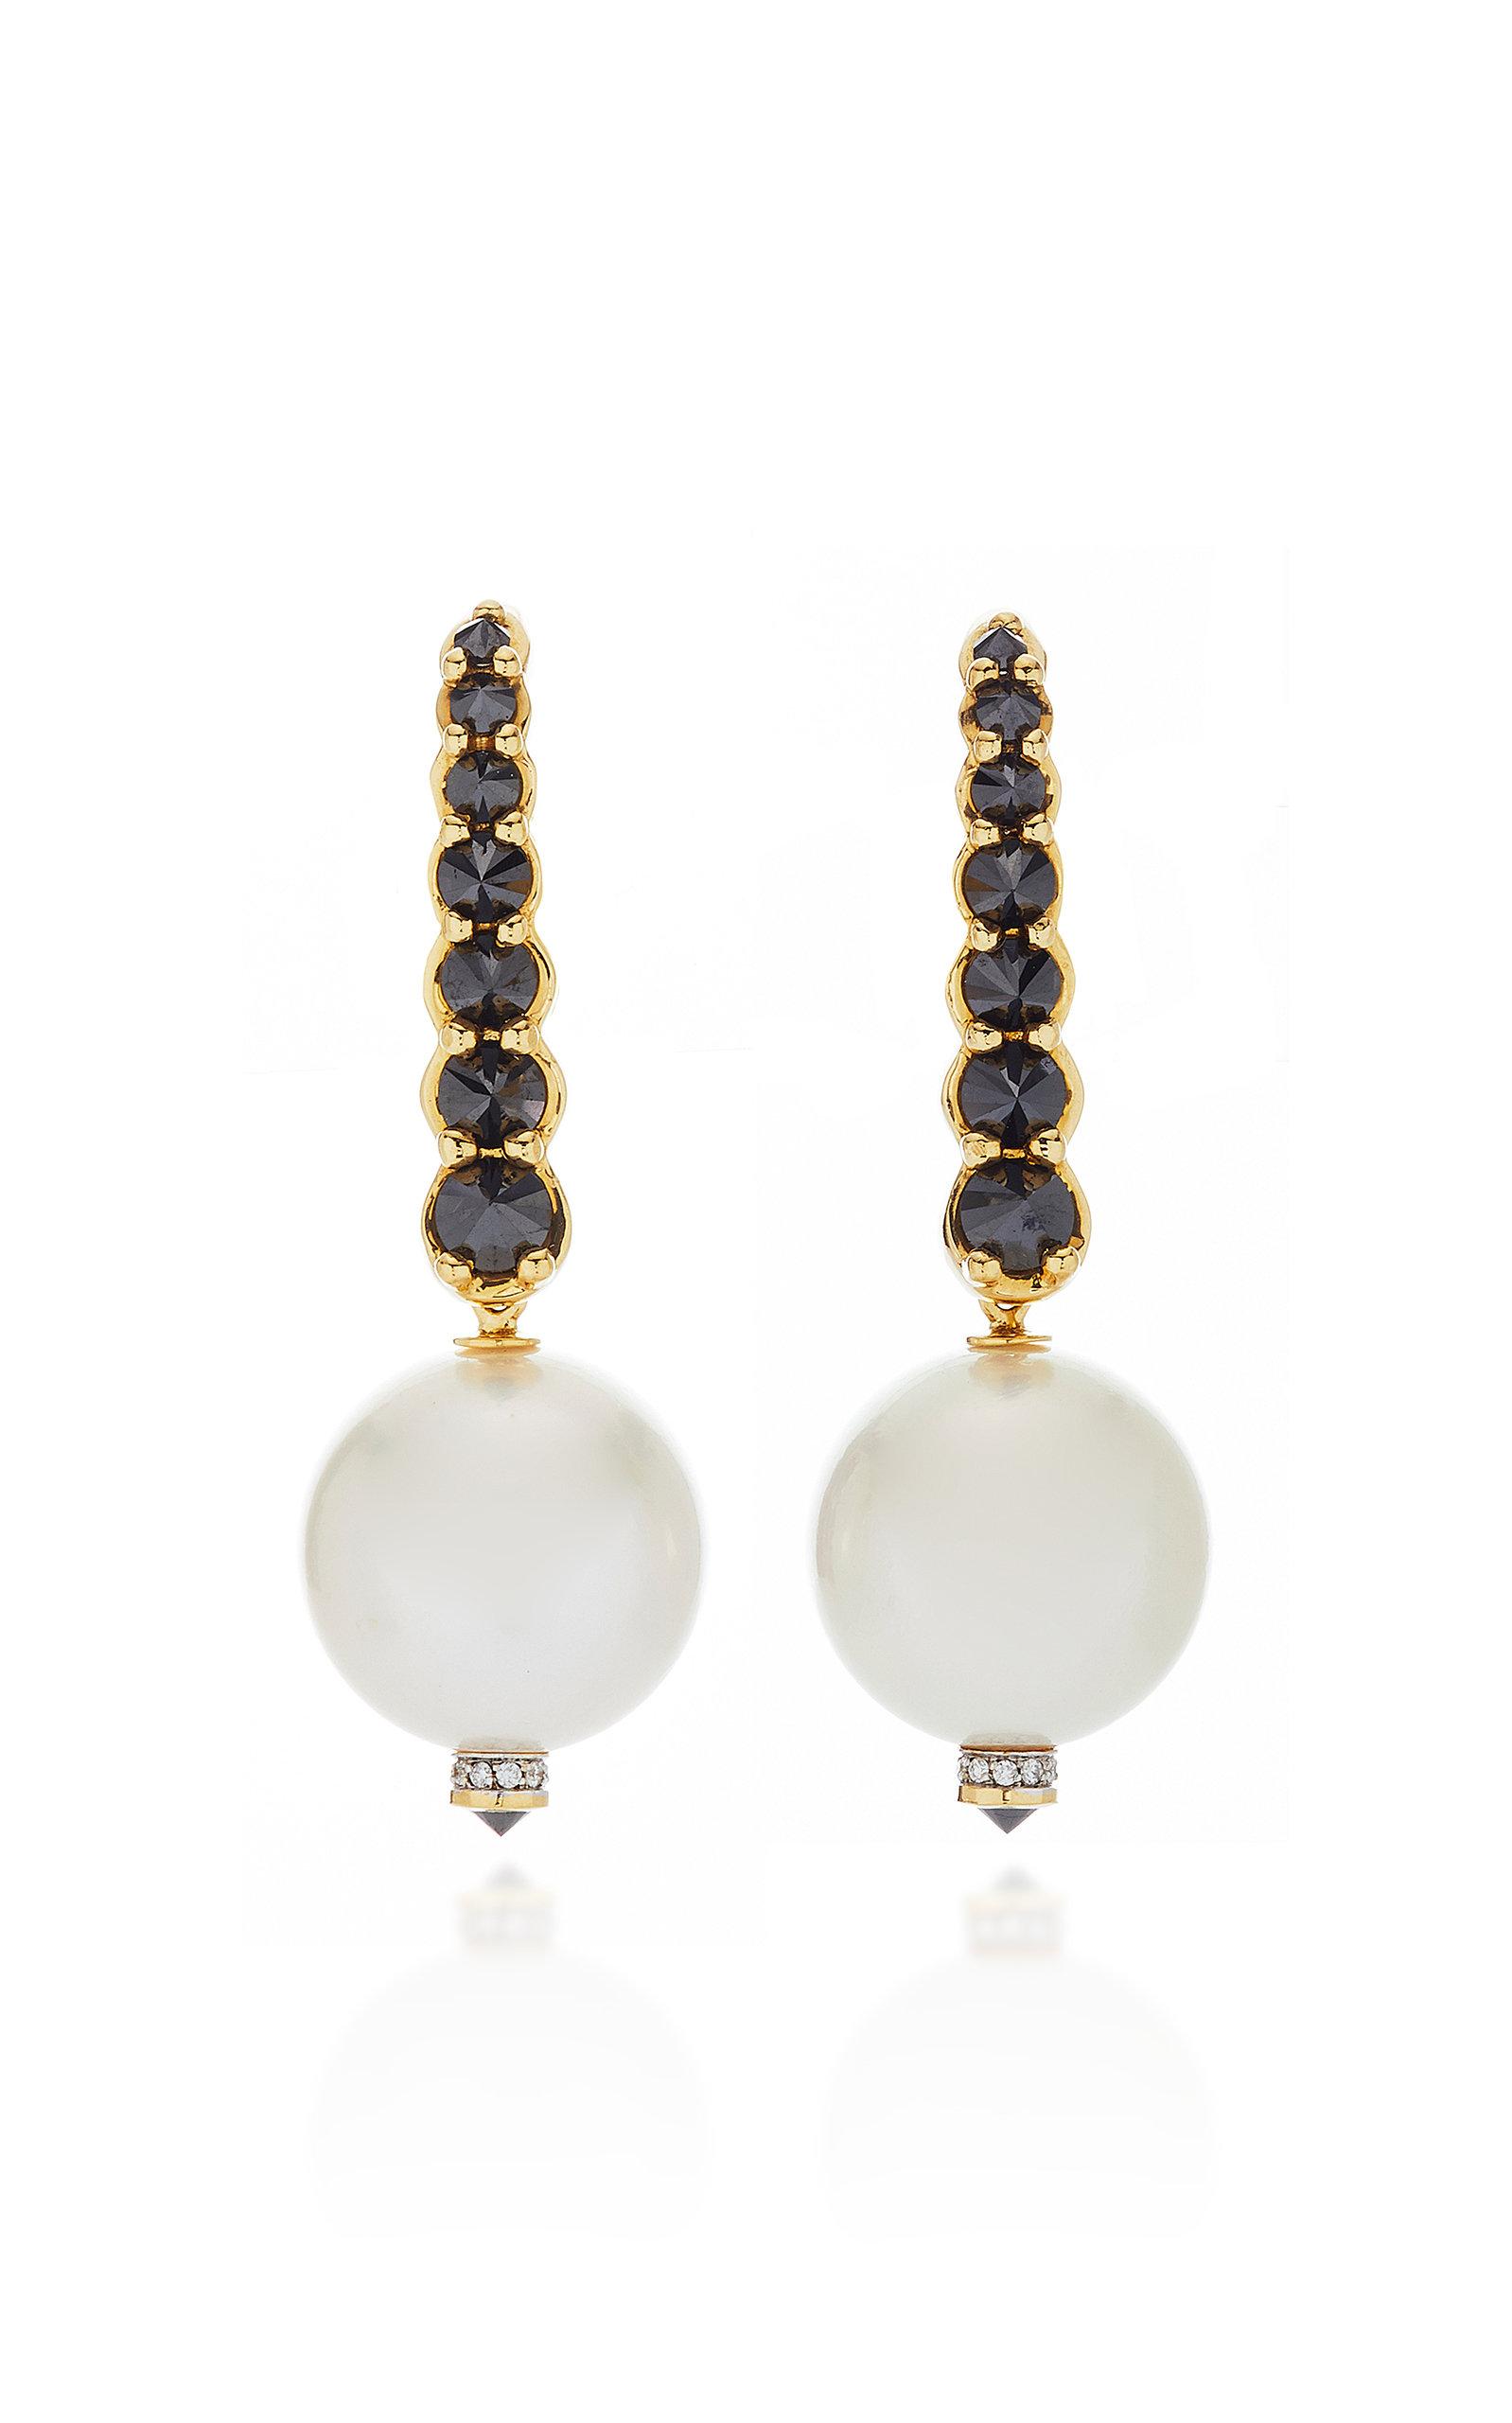 ARA VARTANIAN 18K Gold Earrings With Pearl in White